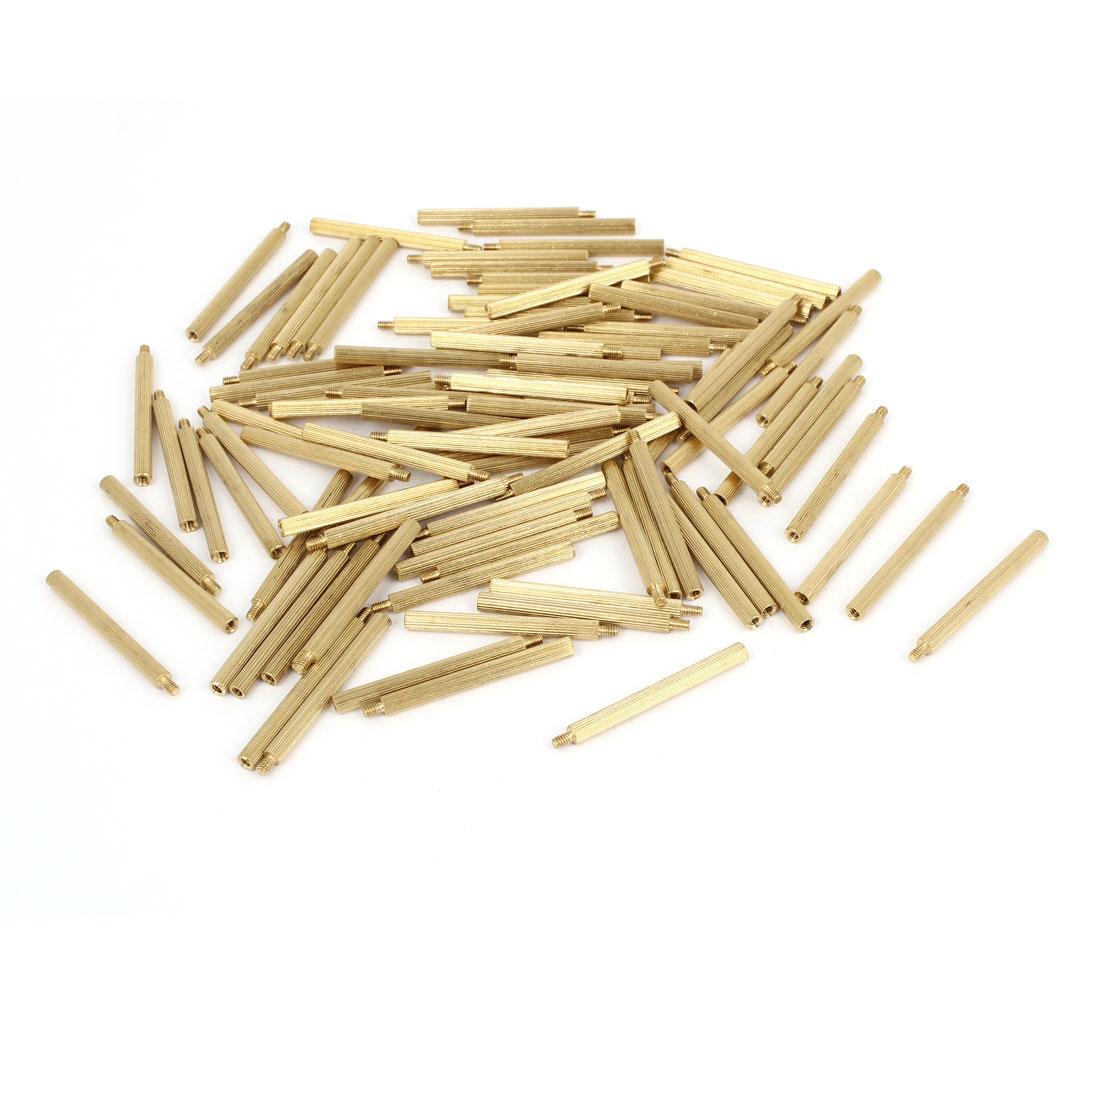 100 Pcs Male to Female Screw Brass Pillars Standoff Spacer M2x31mmx34mm